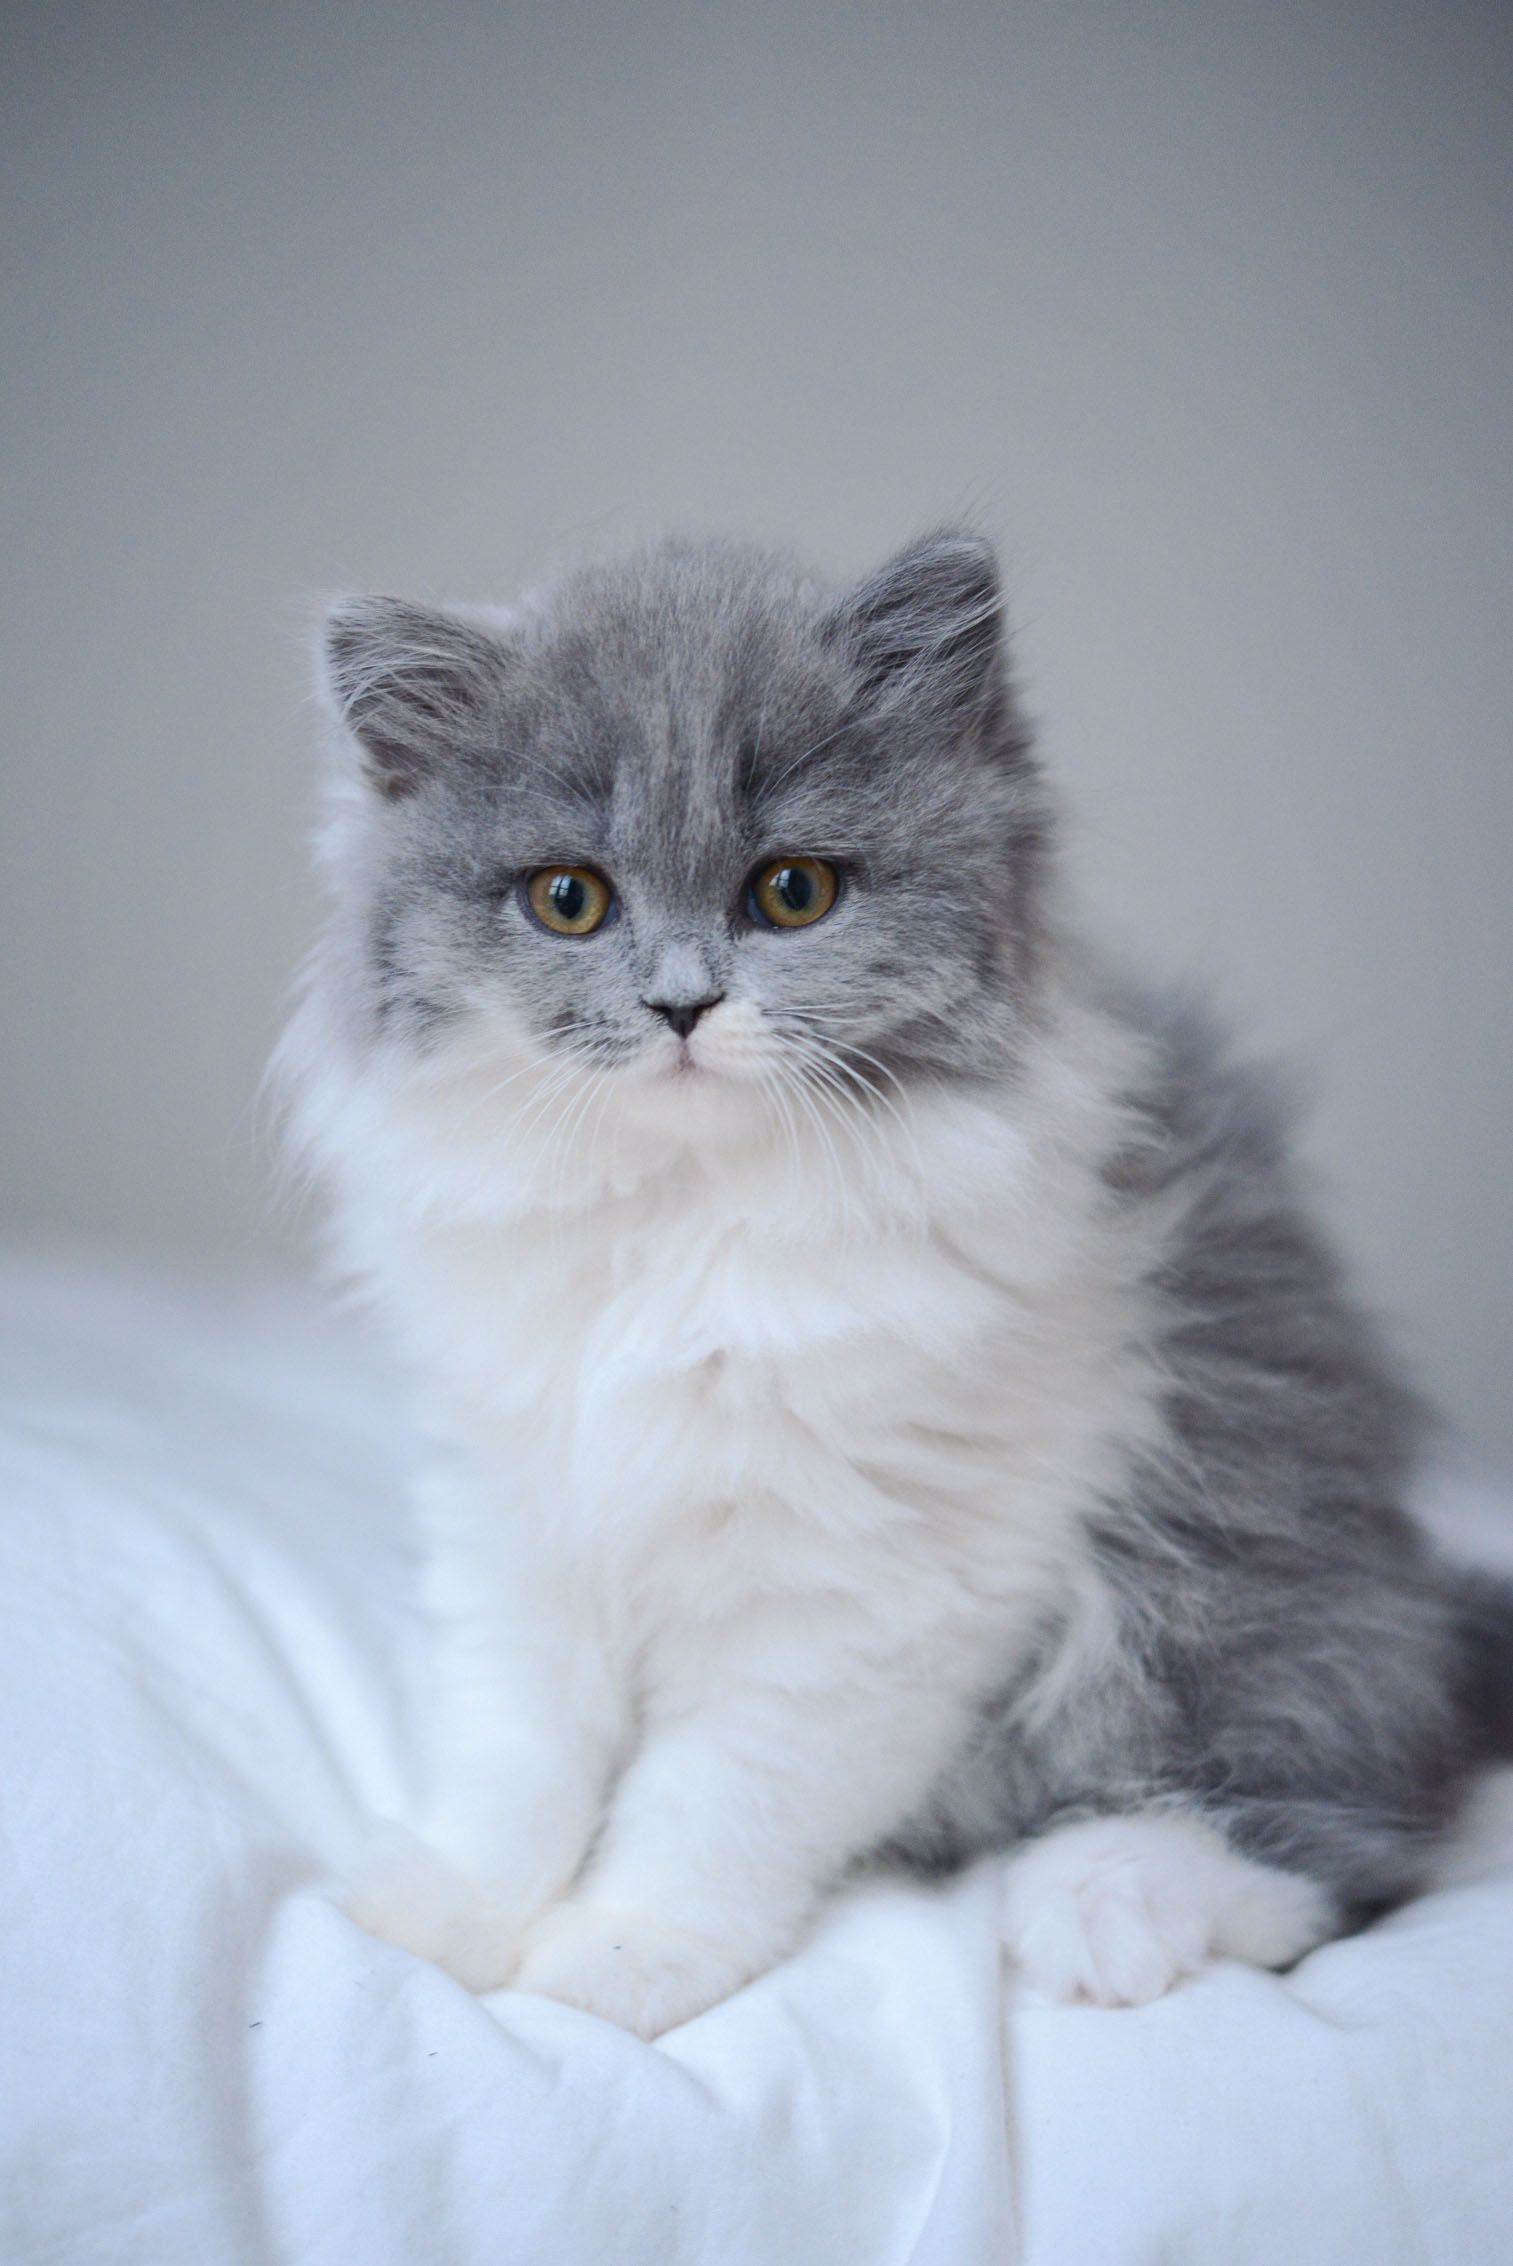 Chat Gris Bicolore Bleu Et Blanc Chaton British Longhair Des British Du Clos D Eugenie Elevage De Britis Grey And White Kitten Kittens Cutest Fluffy Kittens